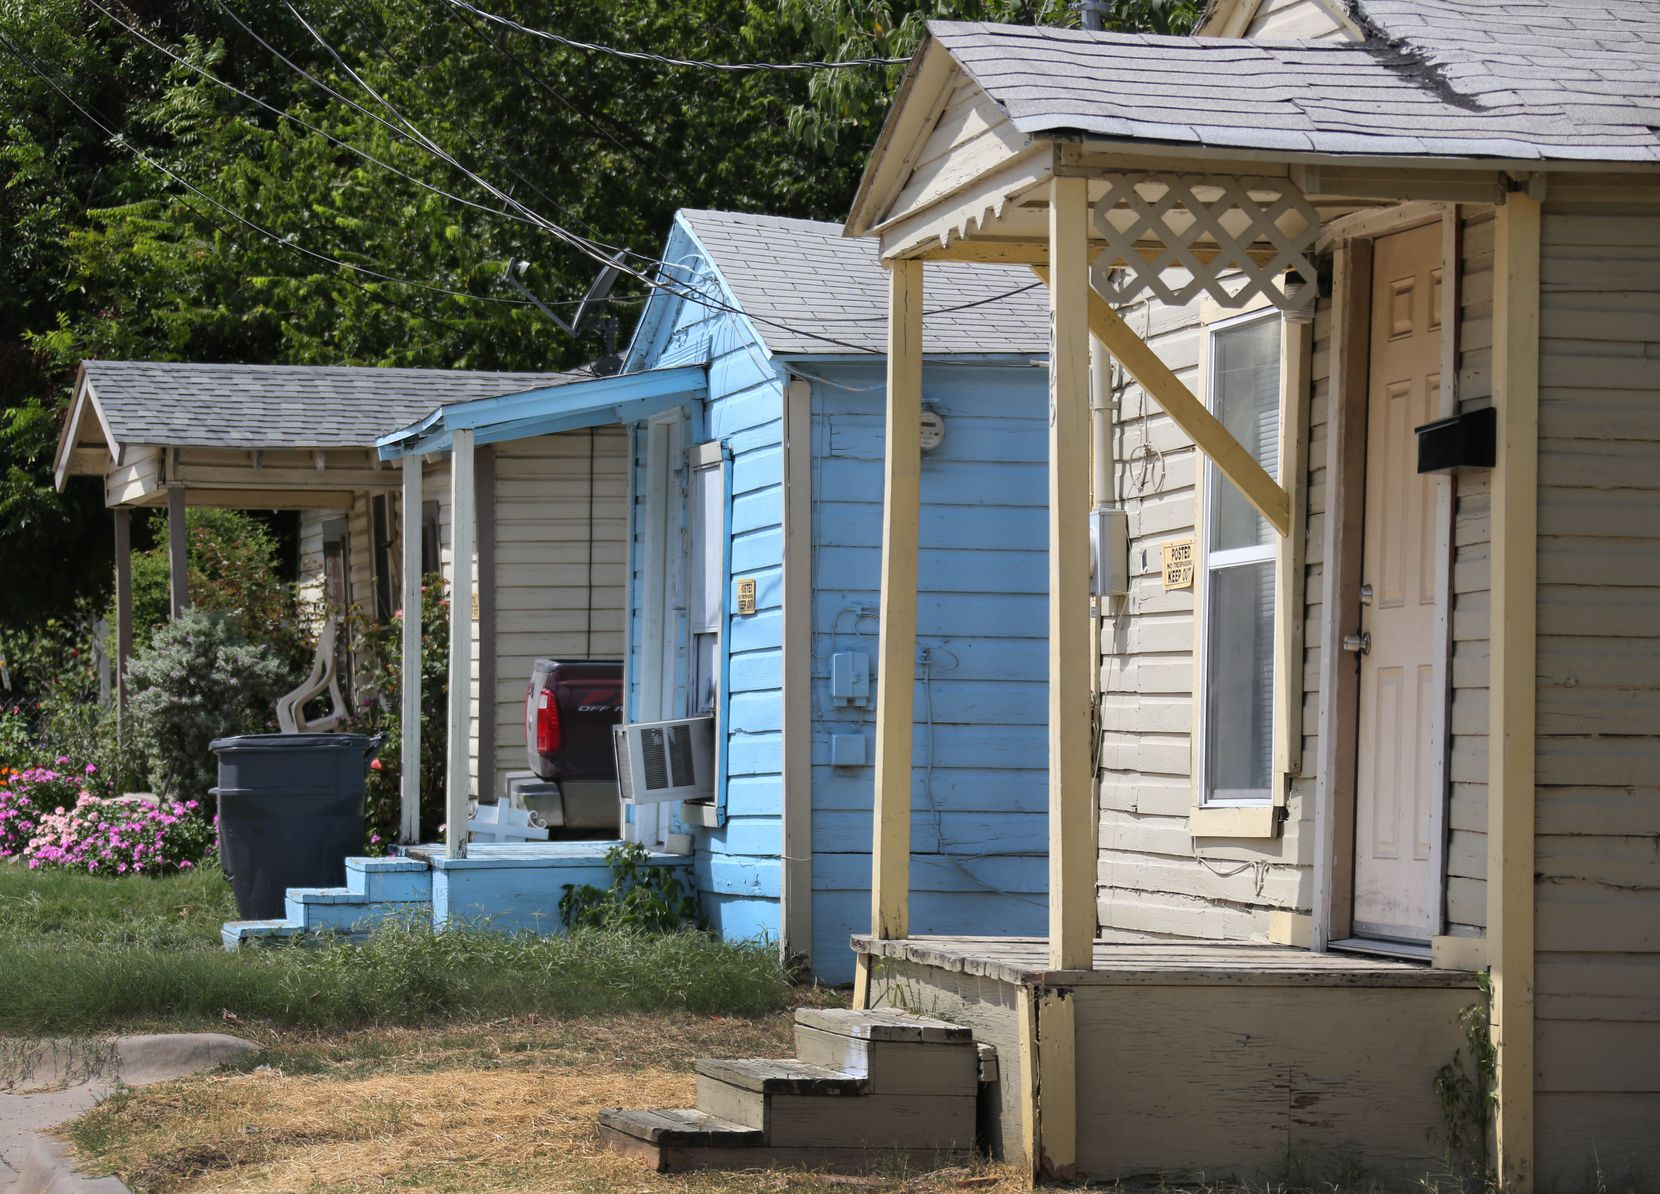 HMK rental properties on Nomas Street in West Dallas.